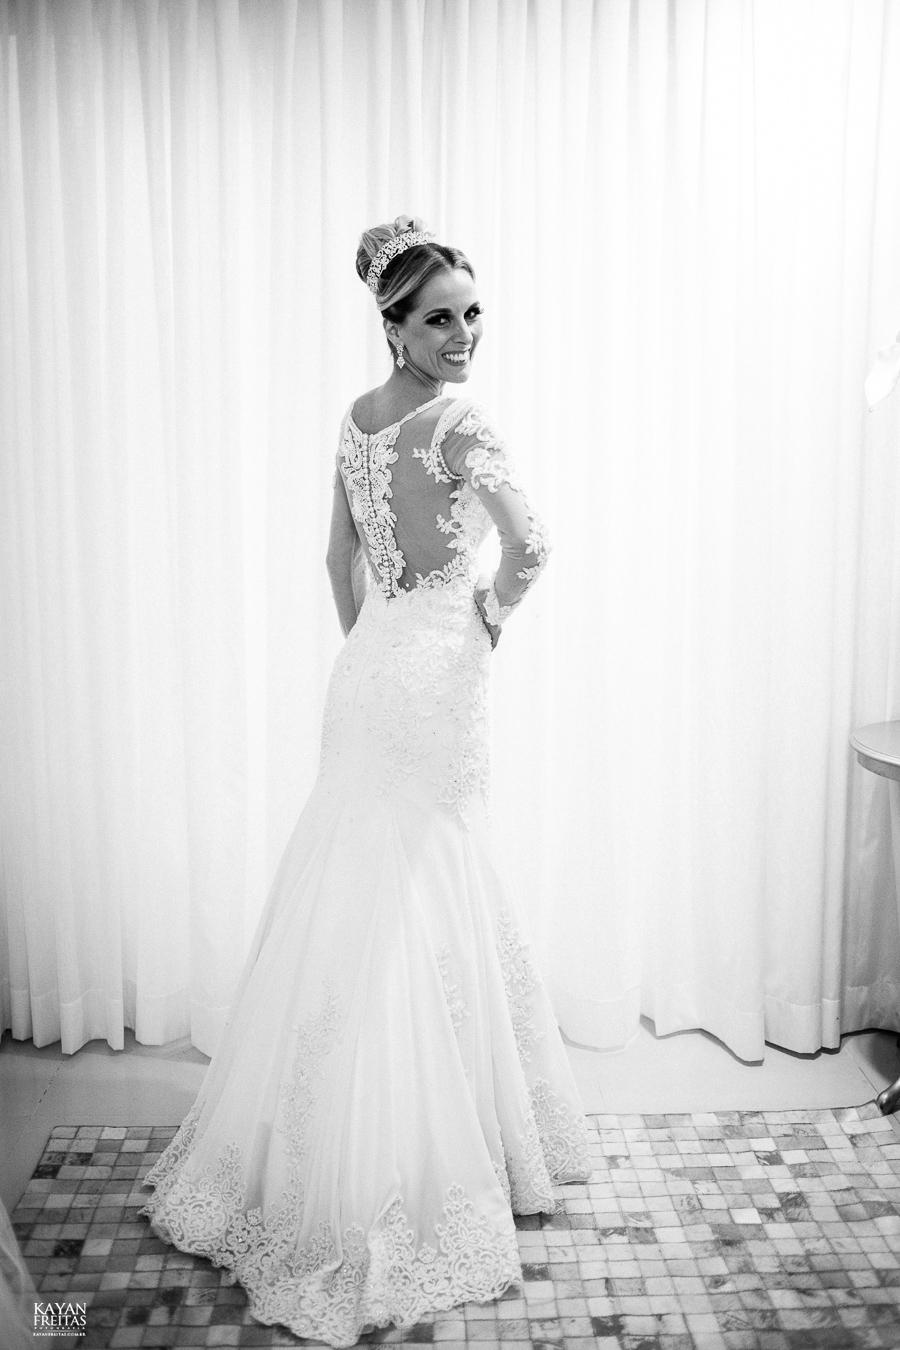 casamento-florianopolis-paula-ramos-0043 Casamento Fabiana e Rafael - Paula Ramos - Florianópolis